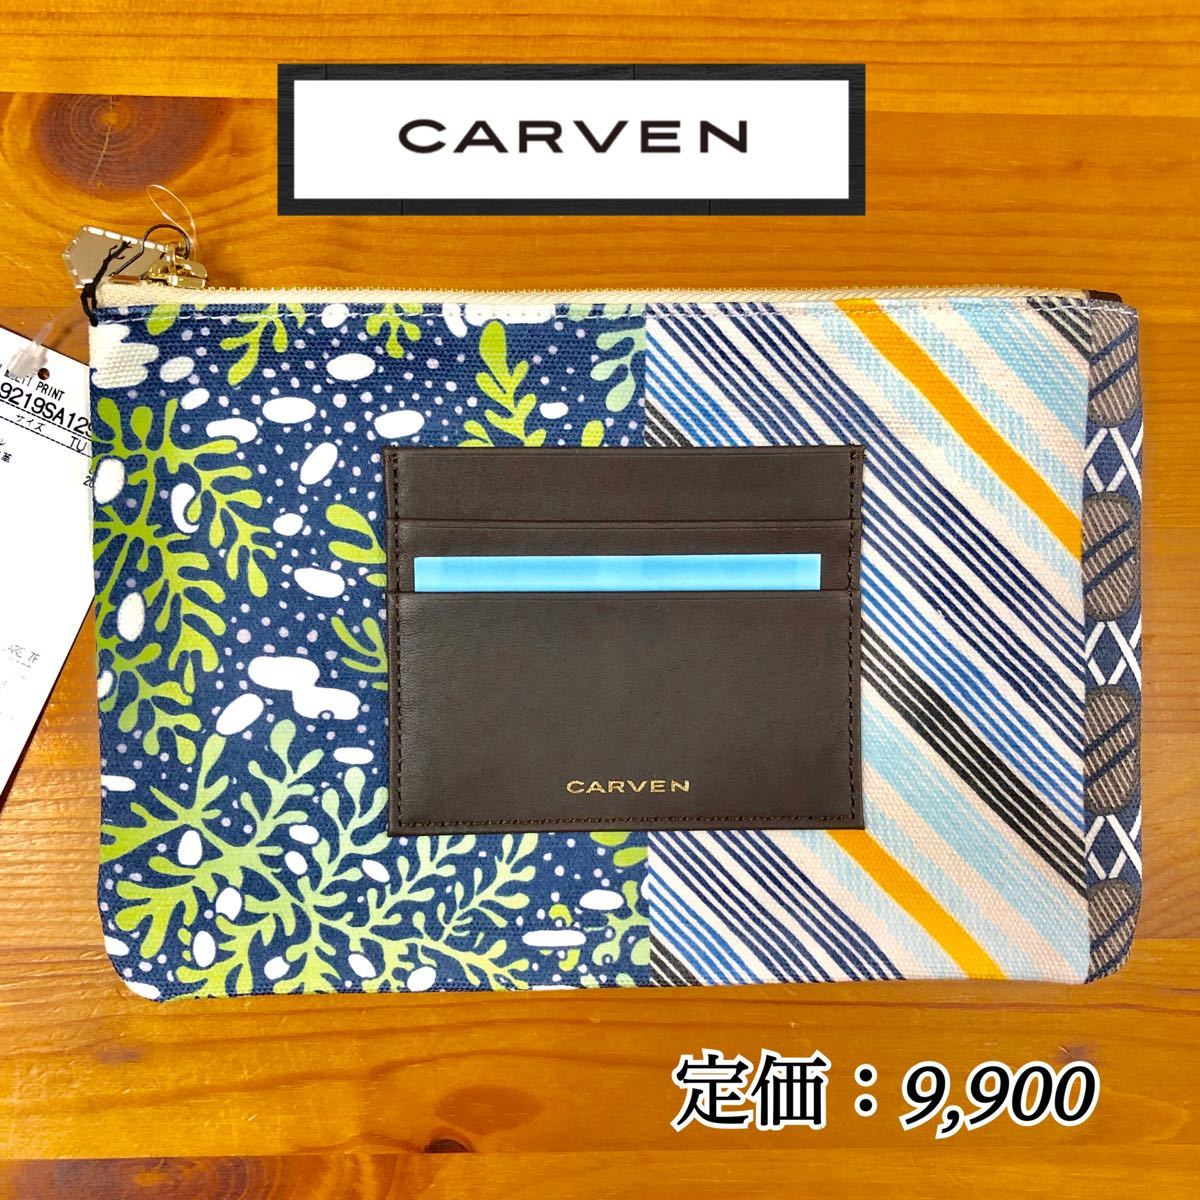 CARVEN 高級 ポーチ マルチポーチ 化粧ポーチ 小物入れ カードケース